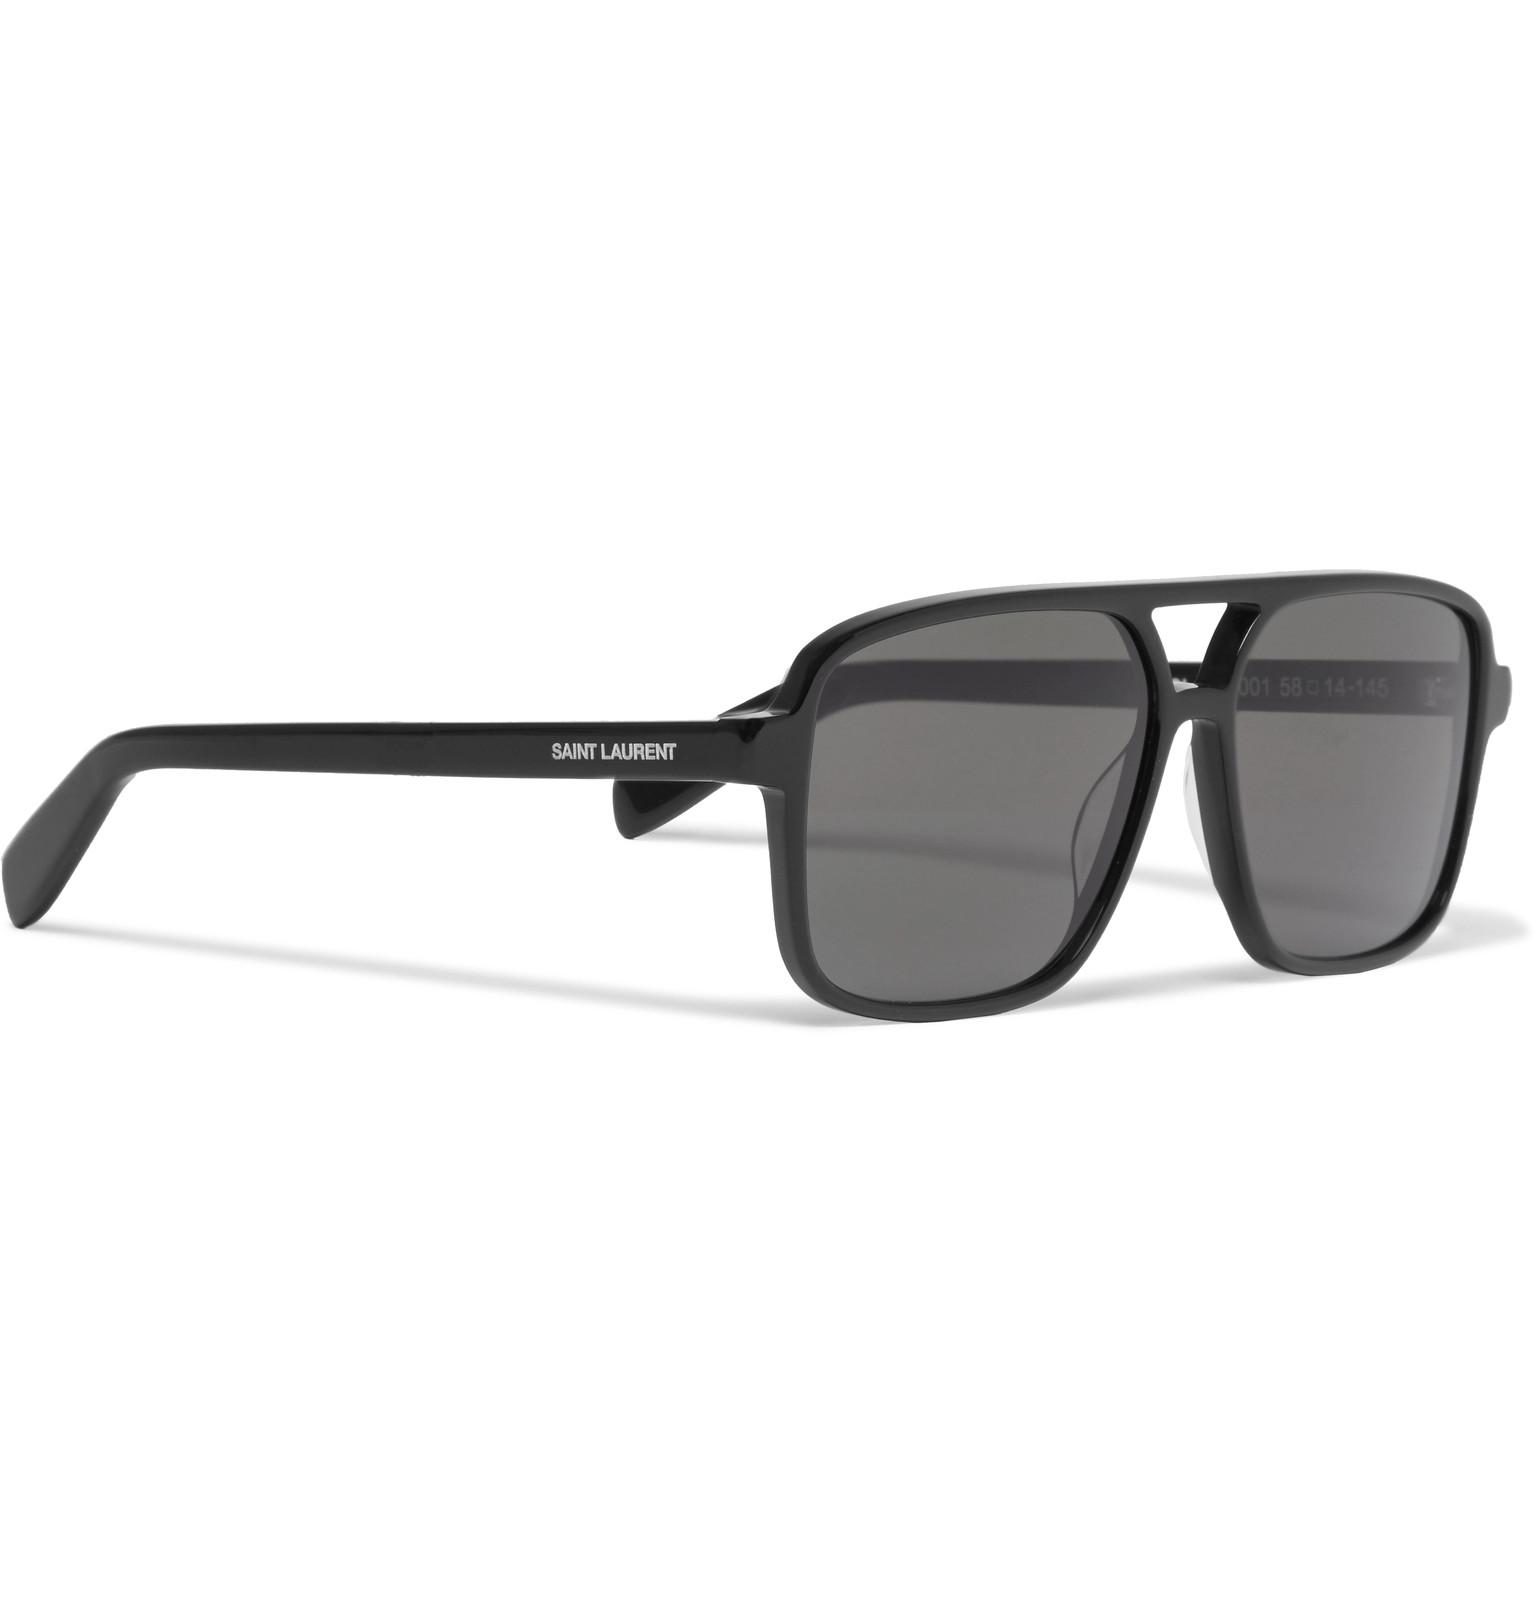 Style Saint Sunglasses Acetate Aviator Laurent xqwFwYzv